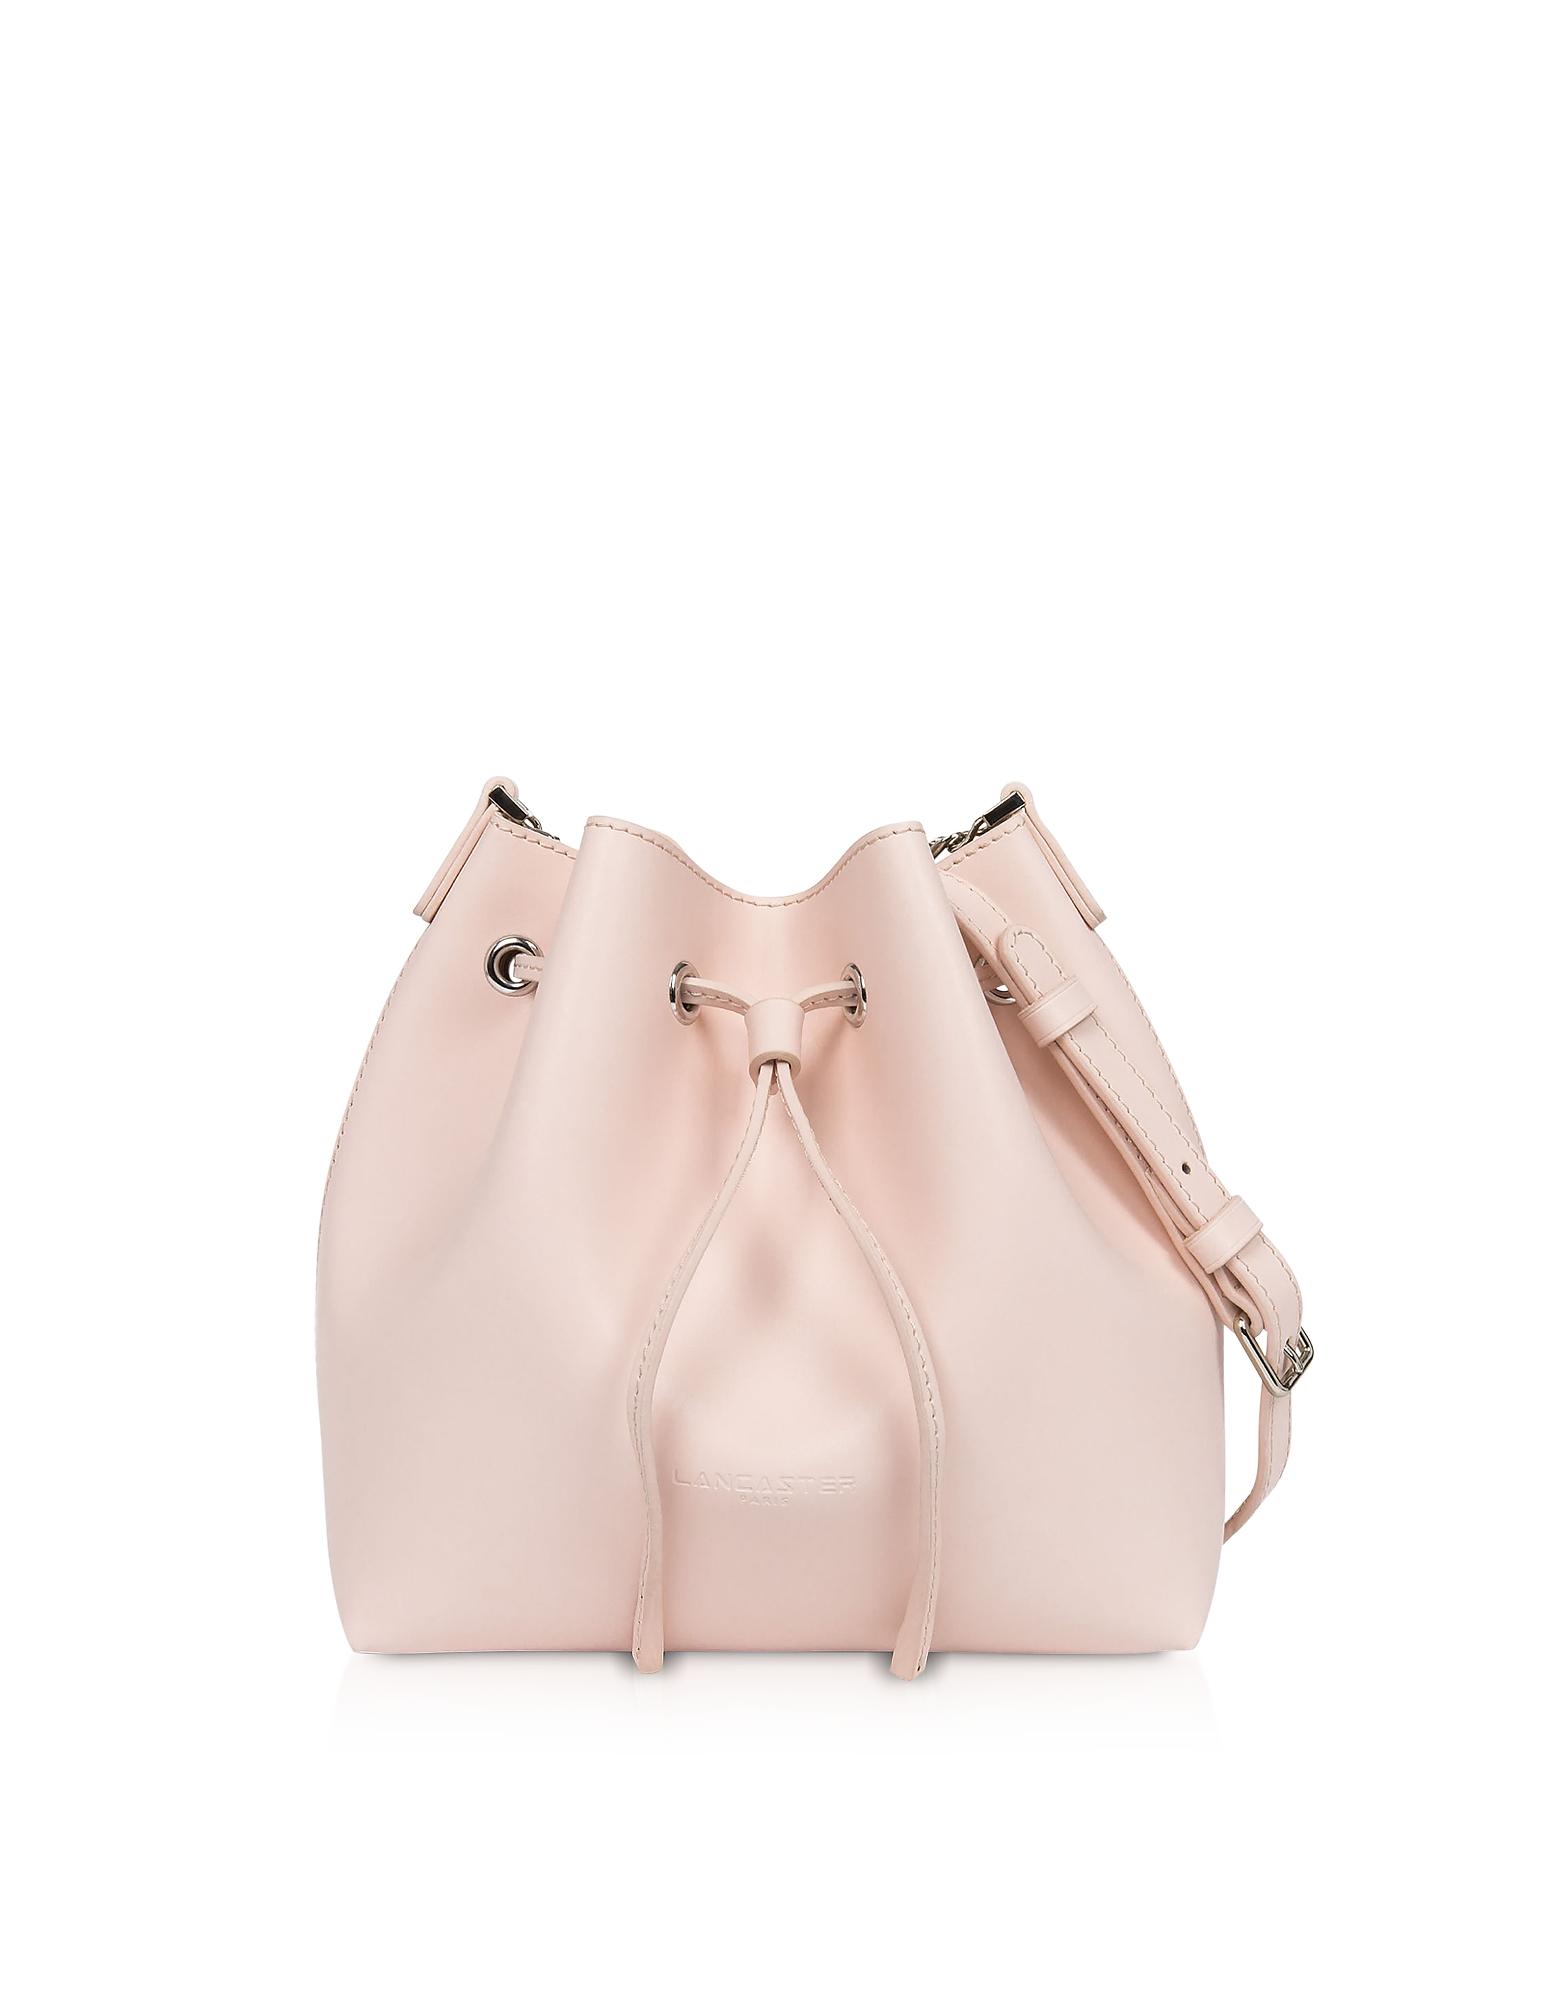 Treasure and Annae Leather Small Bucket Bag